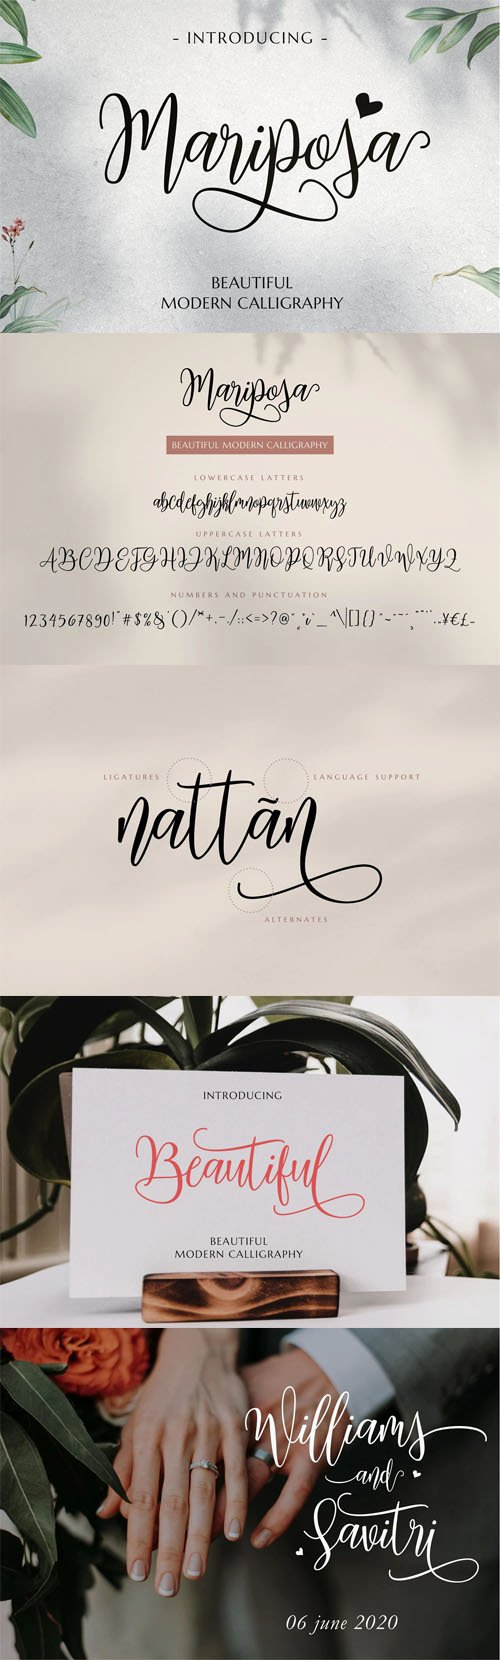 Mariposa - Beautiful Modern Calligraphy